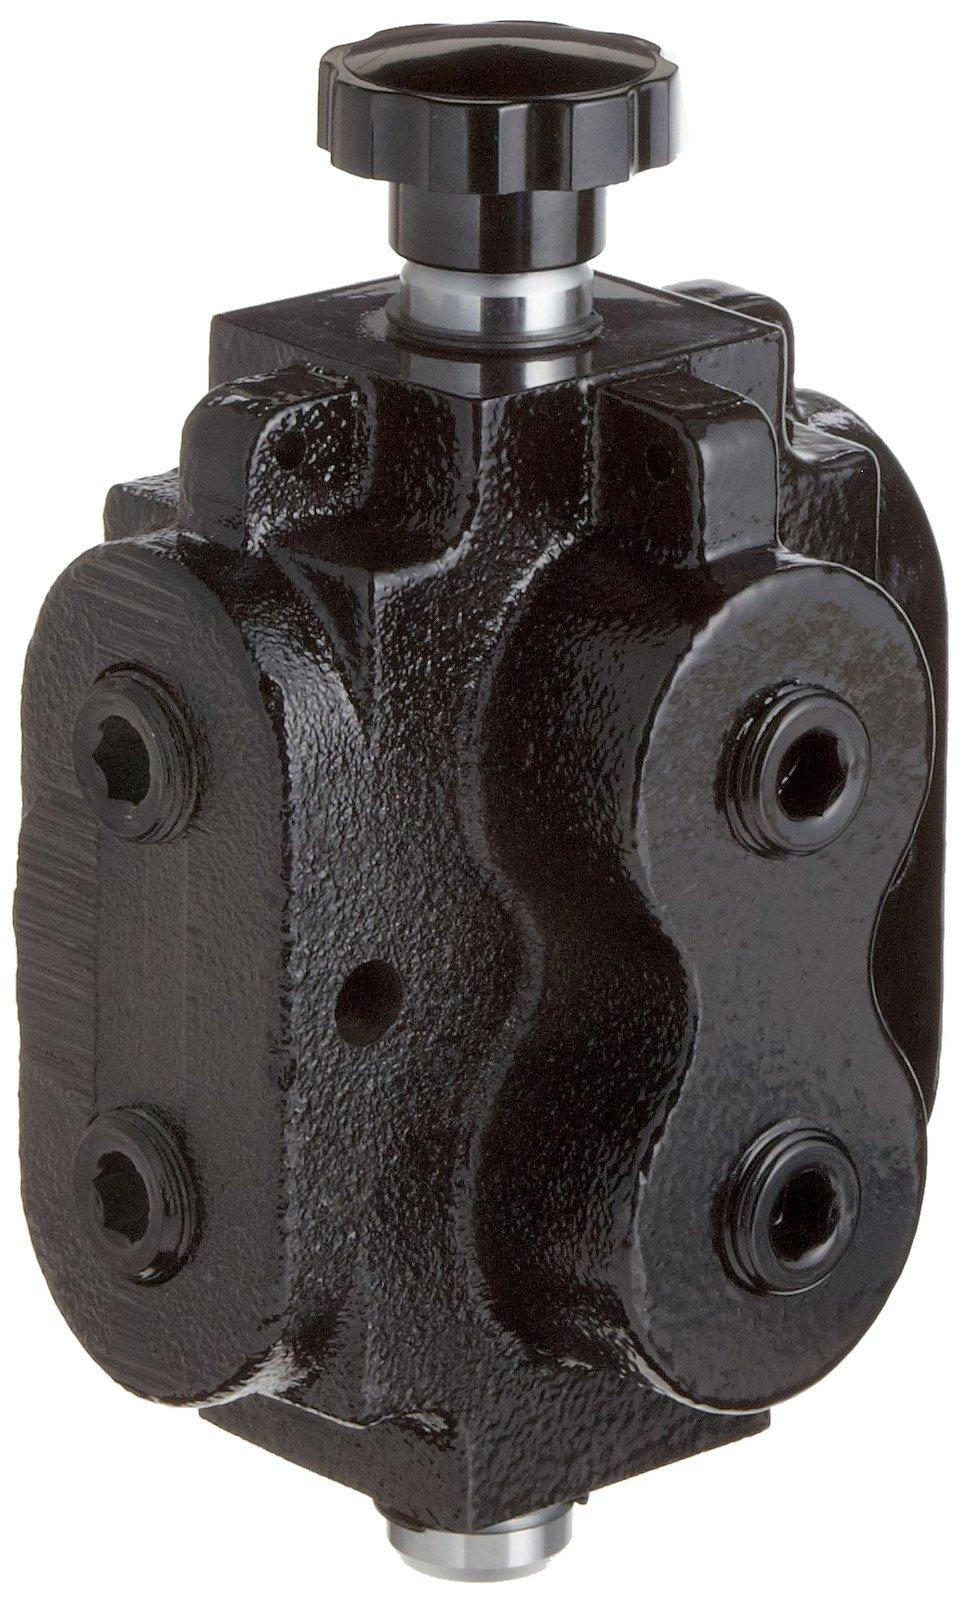 Prince DS-1A1D Directional Control Valve, Monoblock, Cast Iron, 1 Spool, 6 Ways, 2 Positions, Knob Handle, 2500 psi, 40 gpm, 1/2'' NPT Female